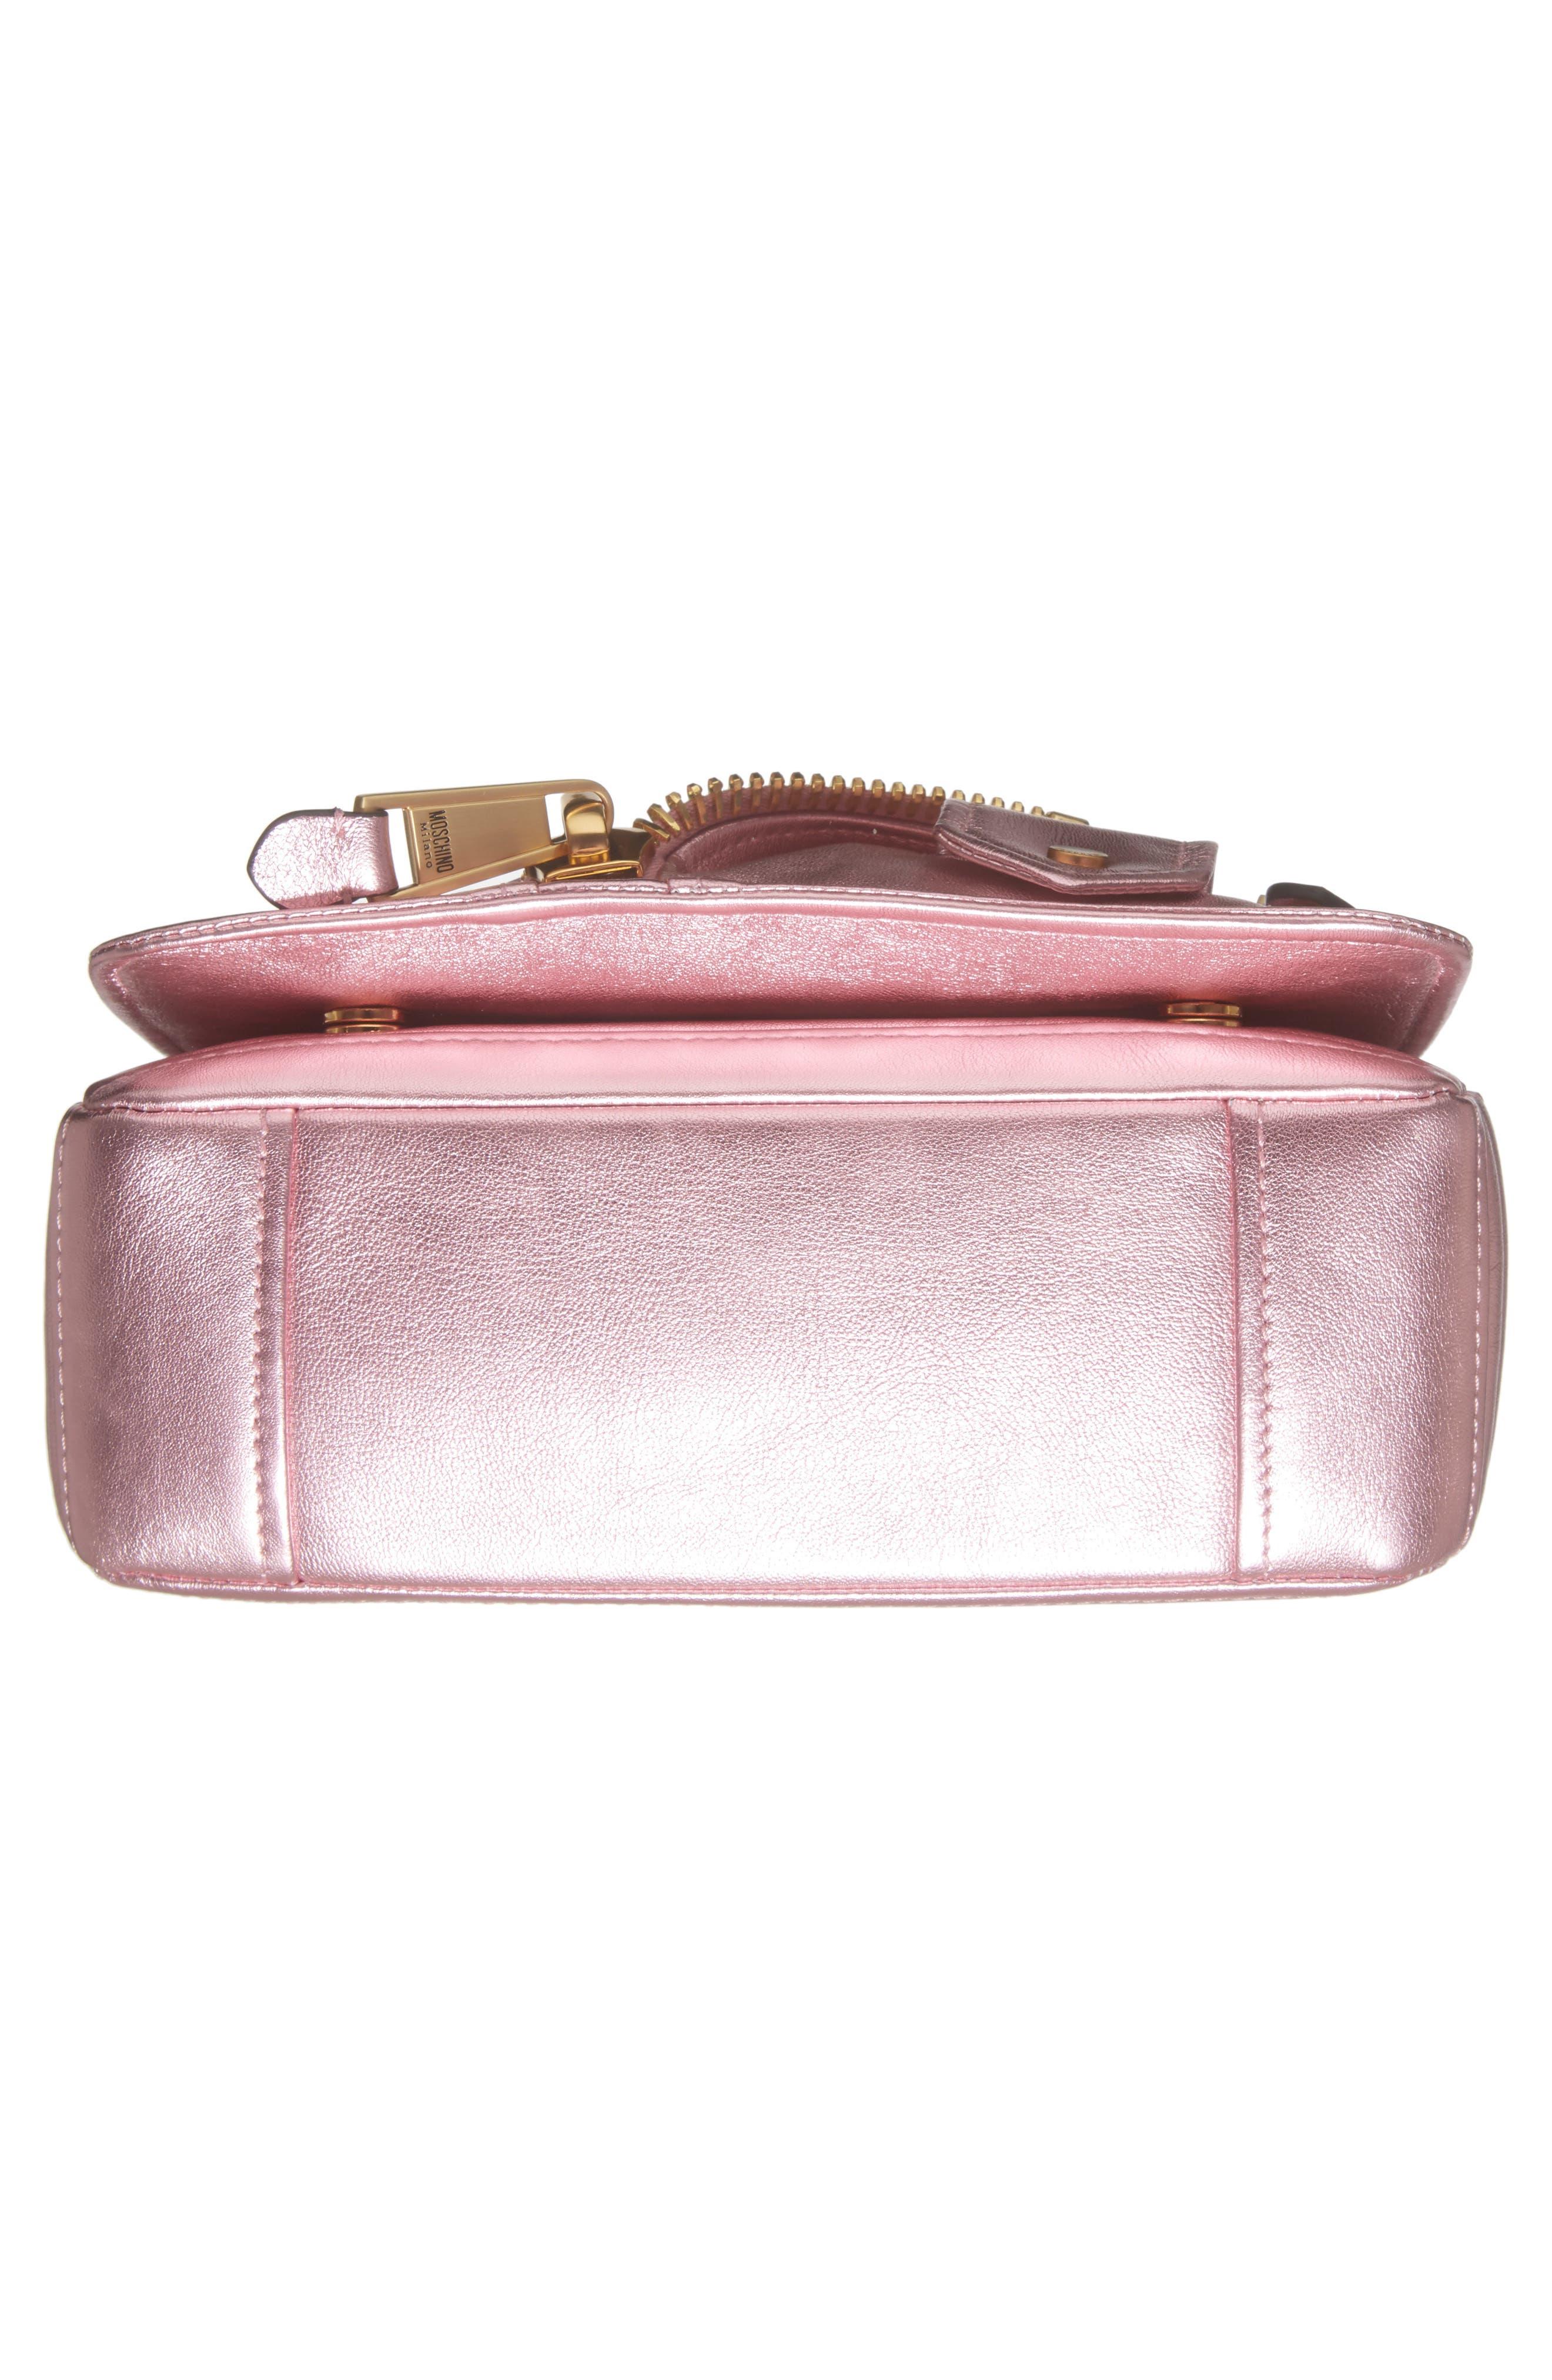 x My Little Pony Biker Jacket Metallic Leather Crossbody Bag,                             Alternate thumbnail 6, color,                             Pink